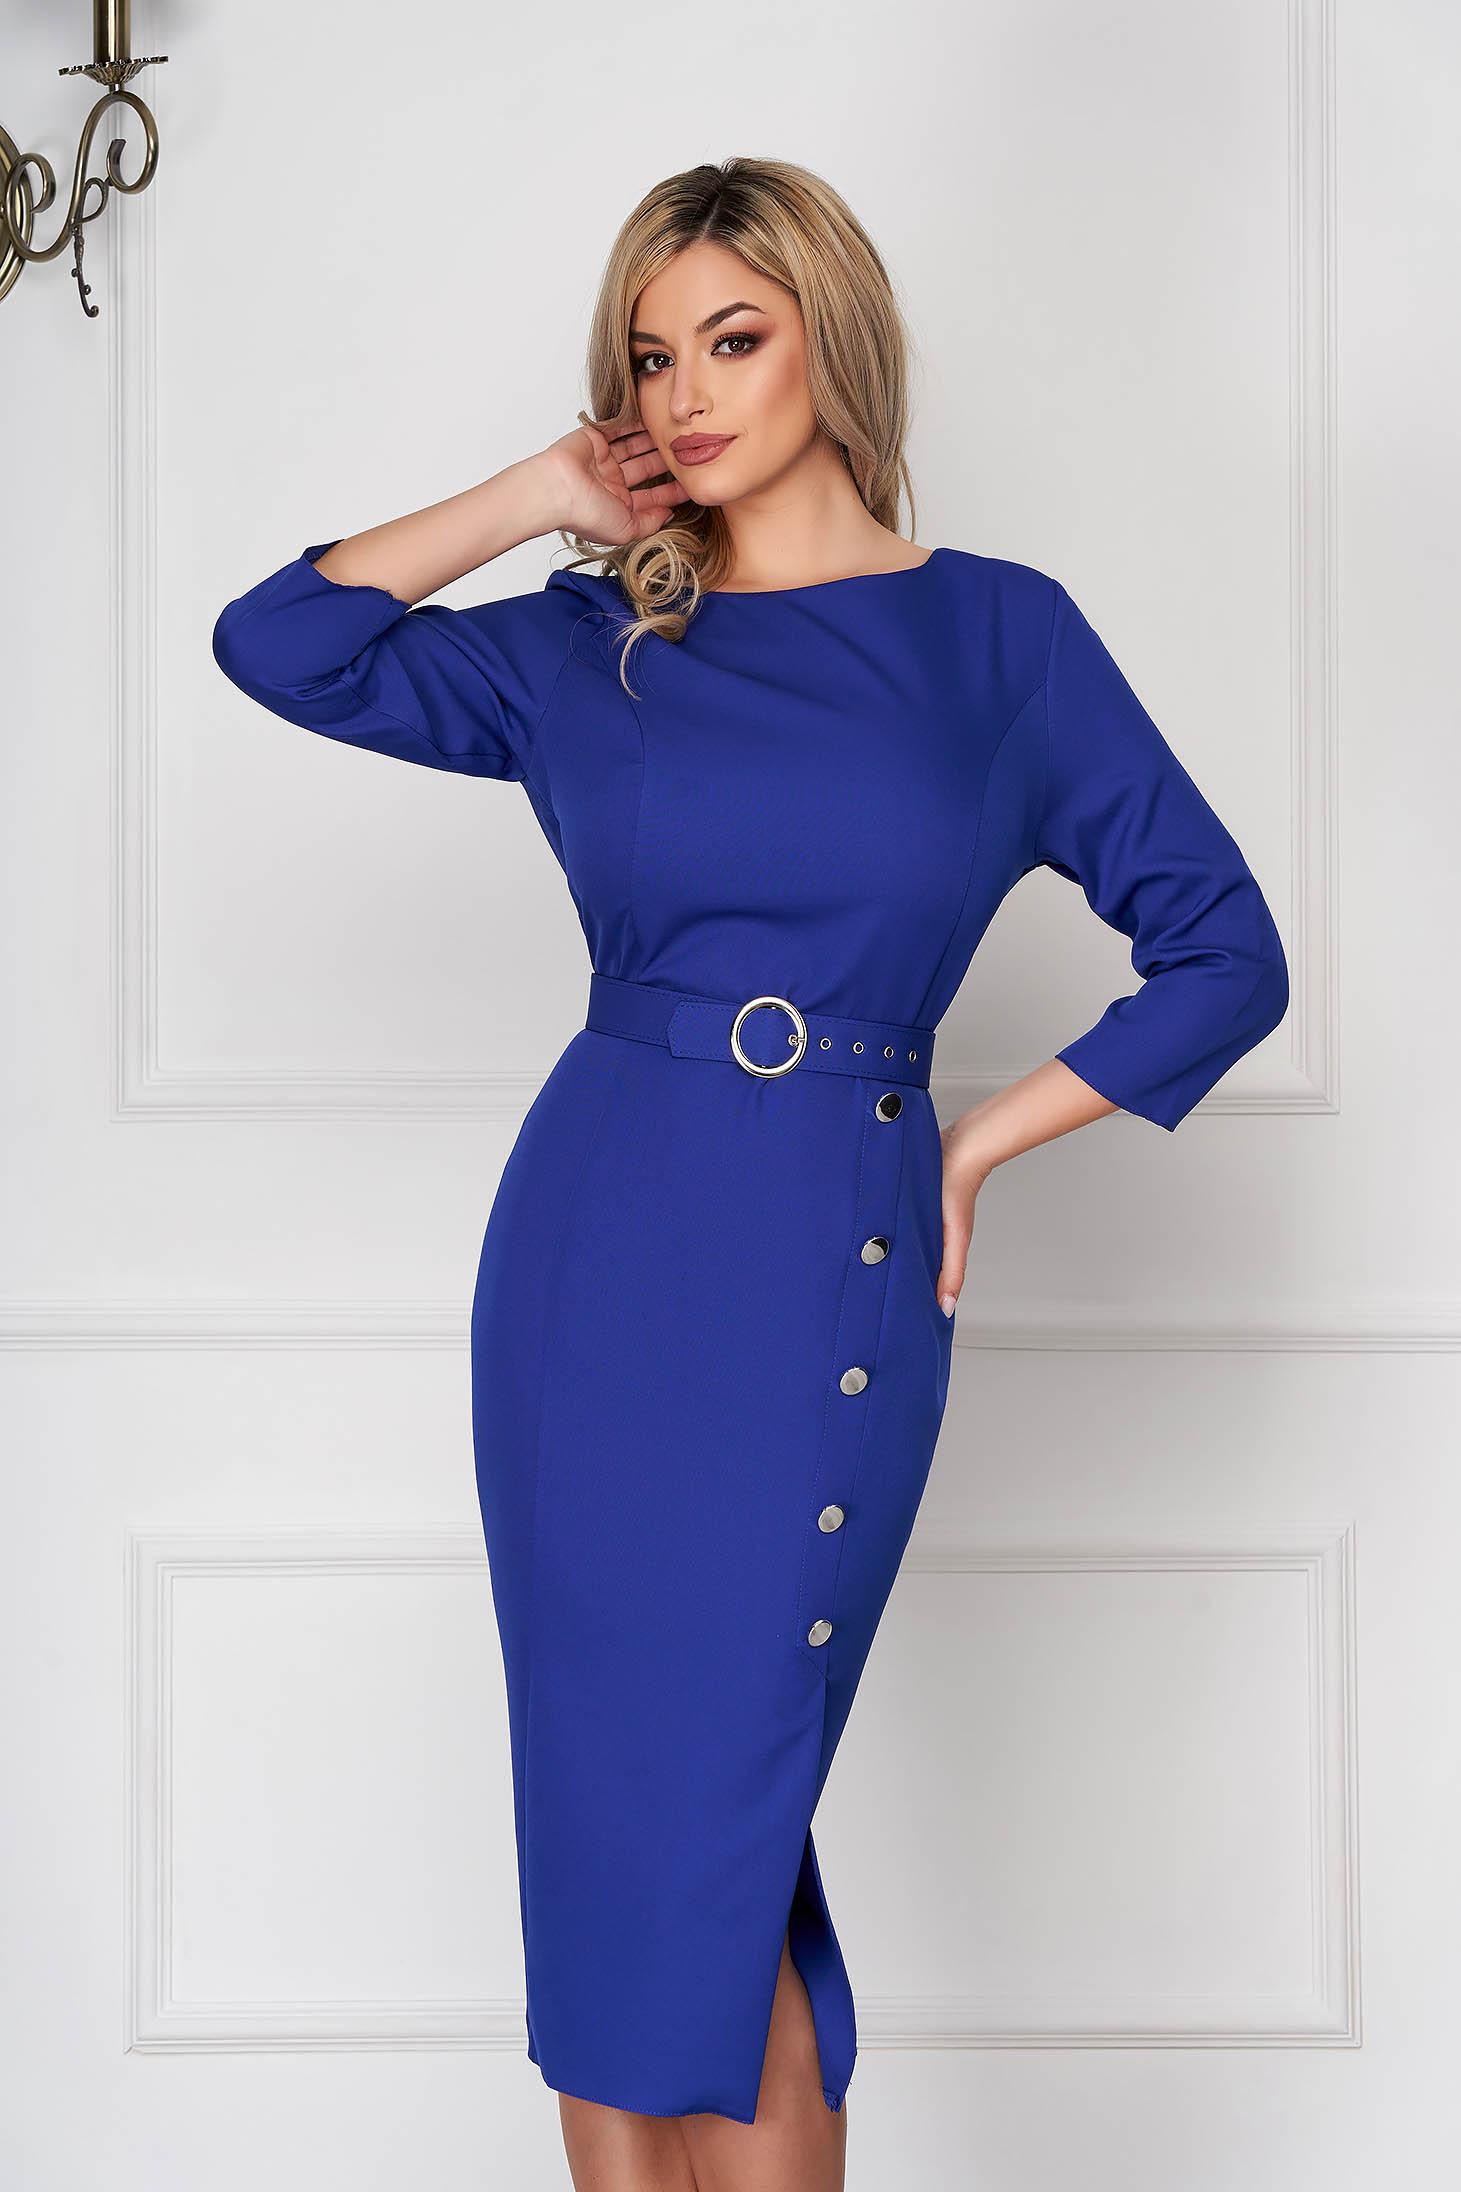 Rochie albastra office midi tip creion din stofa subtire accesorizata cu nasturi